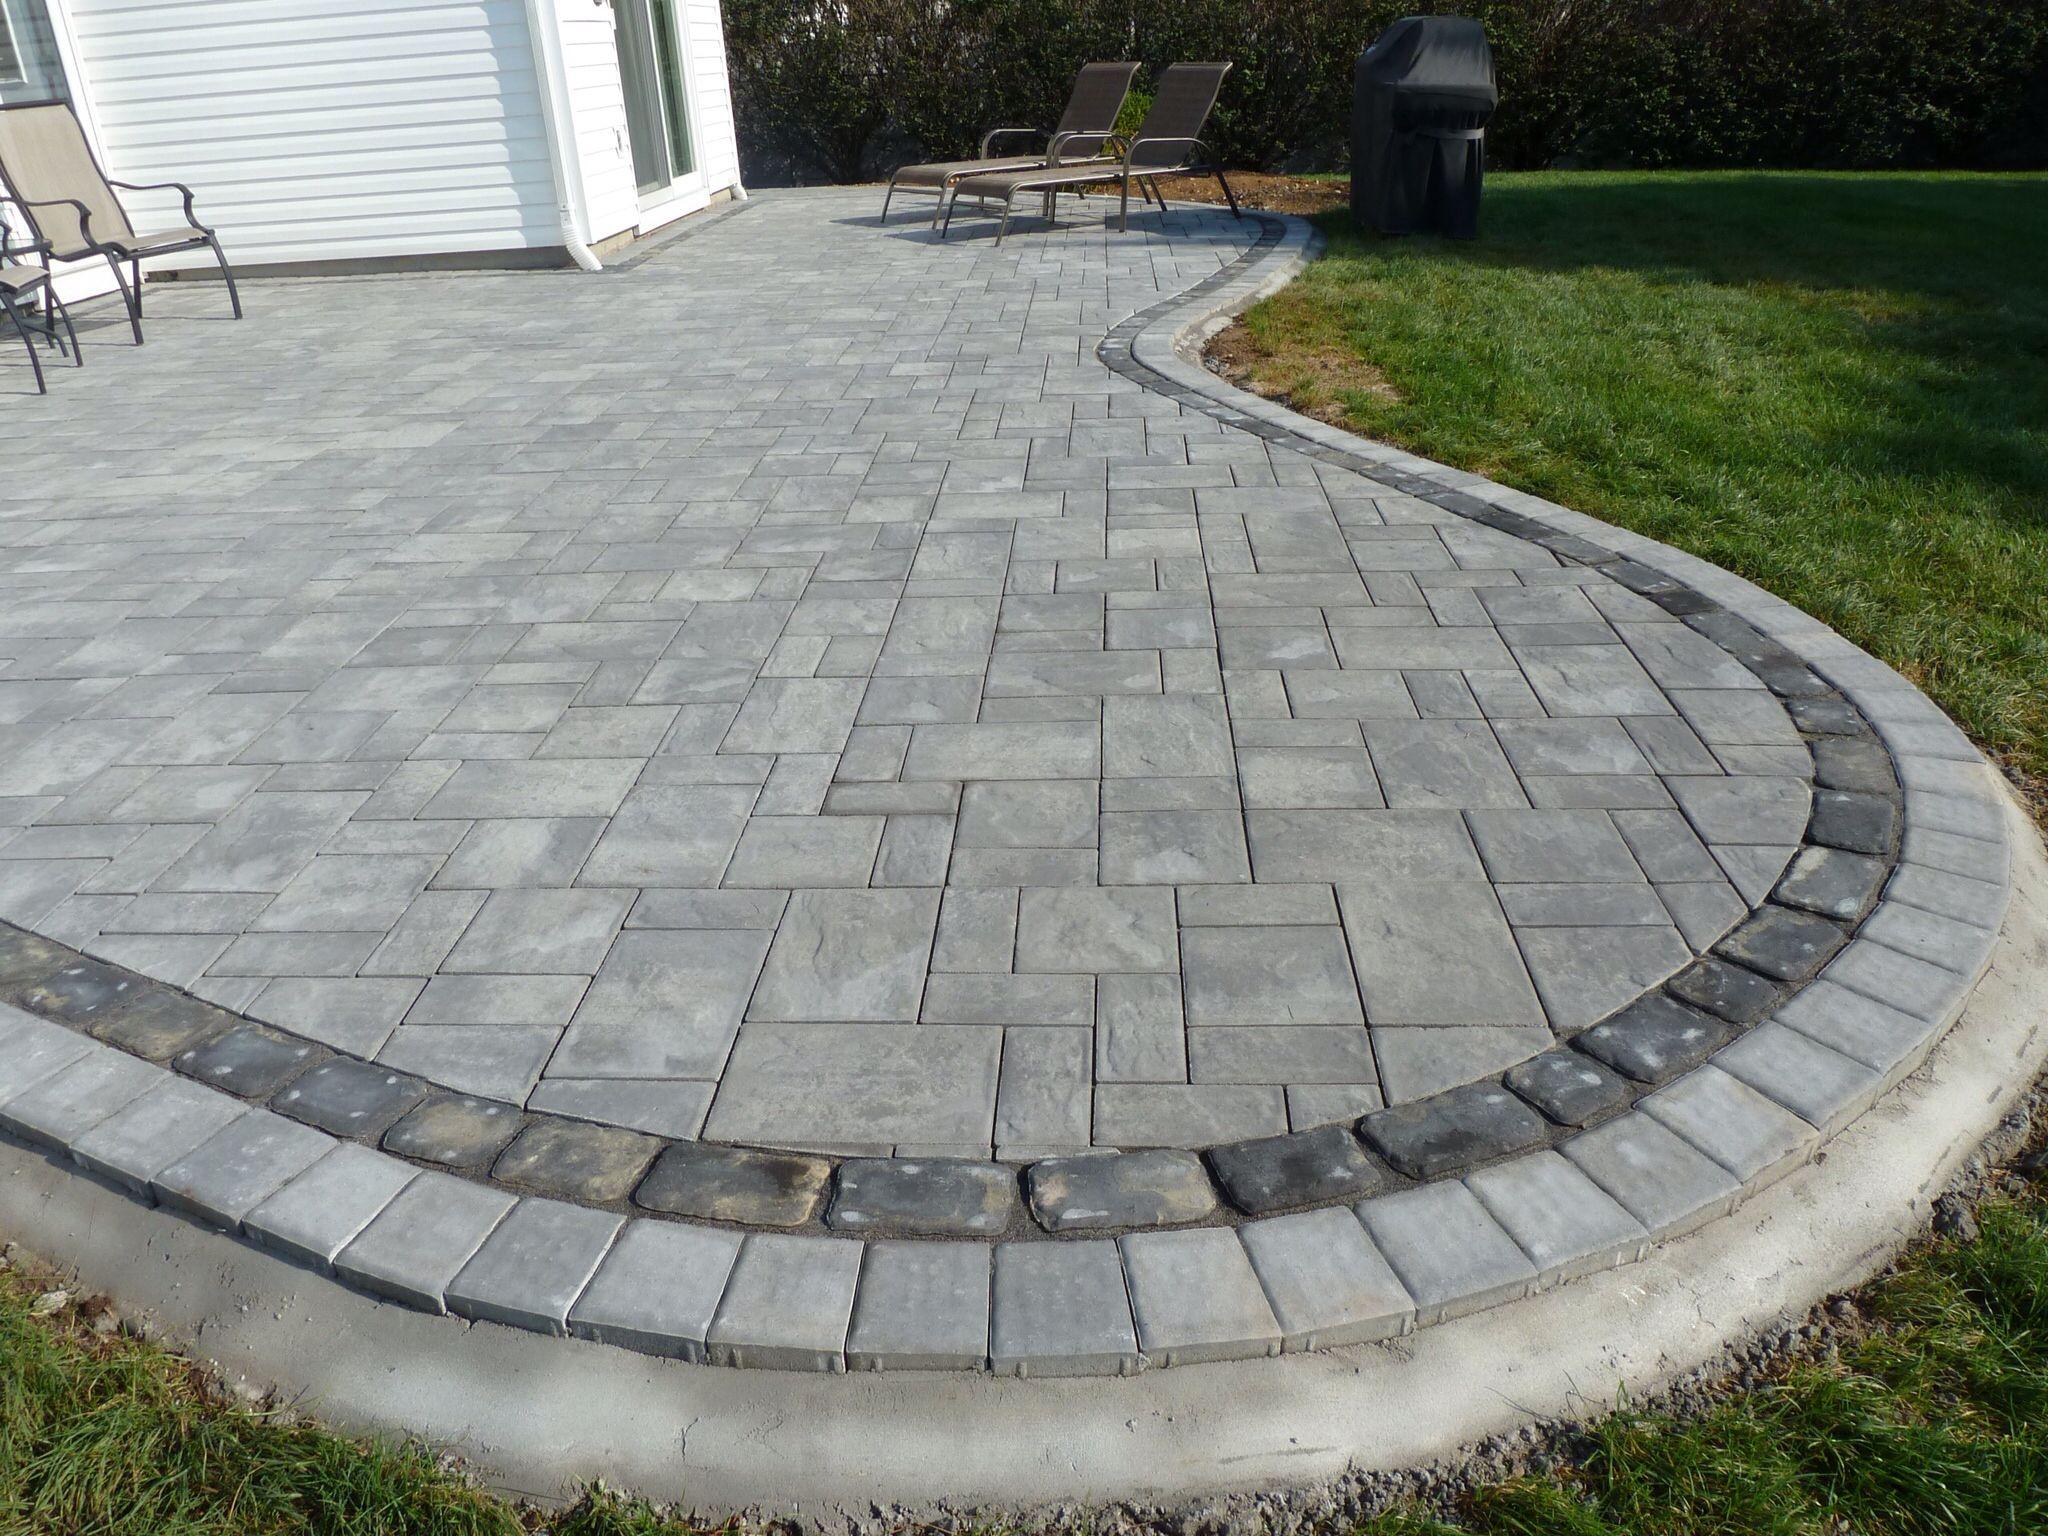 Best Cambridge Pavers For Outdoor Flooring Decor Ledgestone Onyx Natural Cambridge Pavers For Attractive Outdoor Living Sp Paver Patio Brick Paver Patio Patio